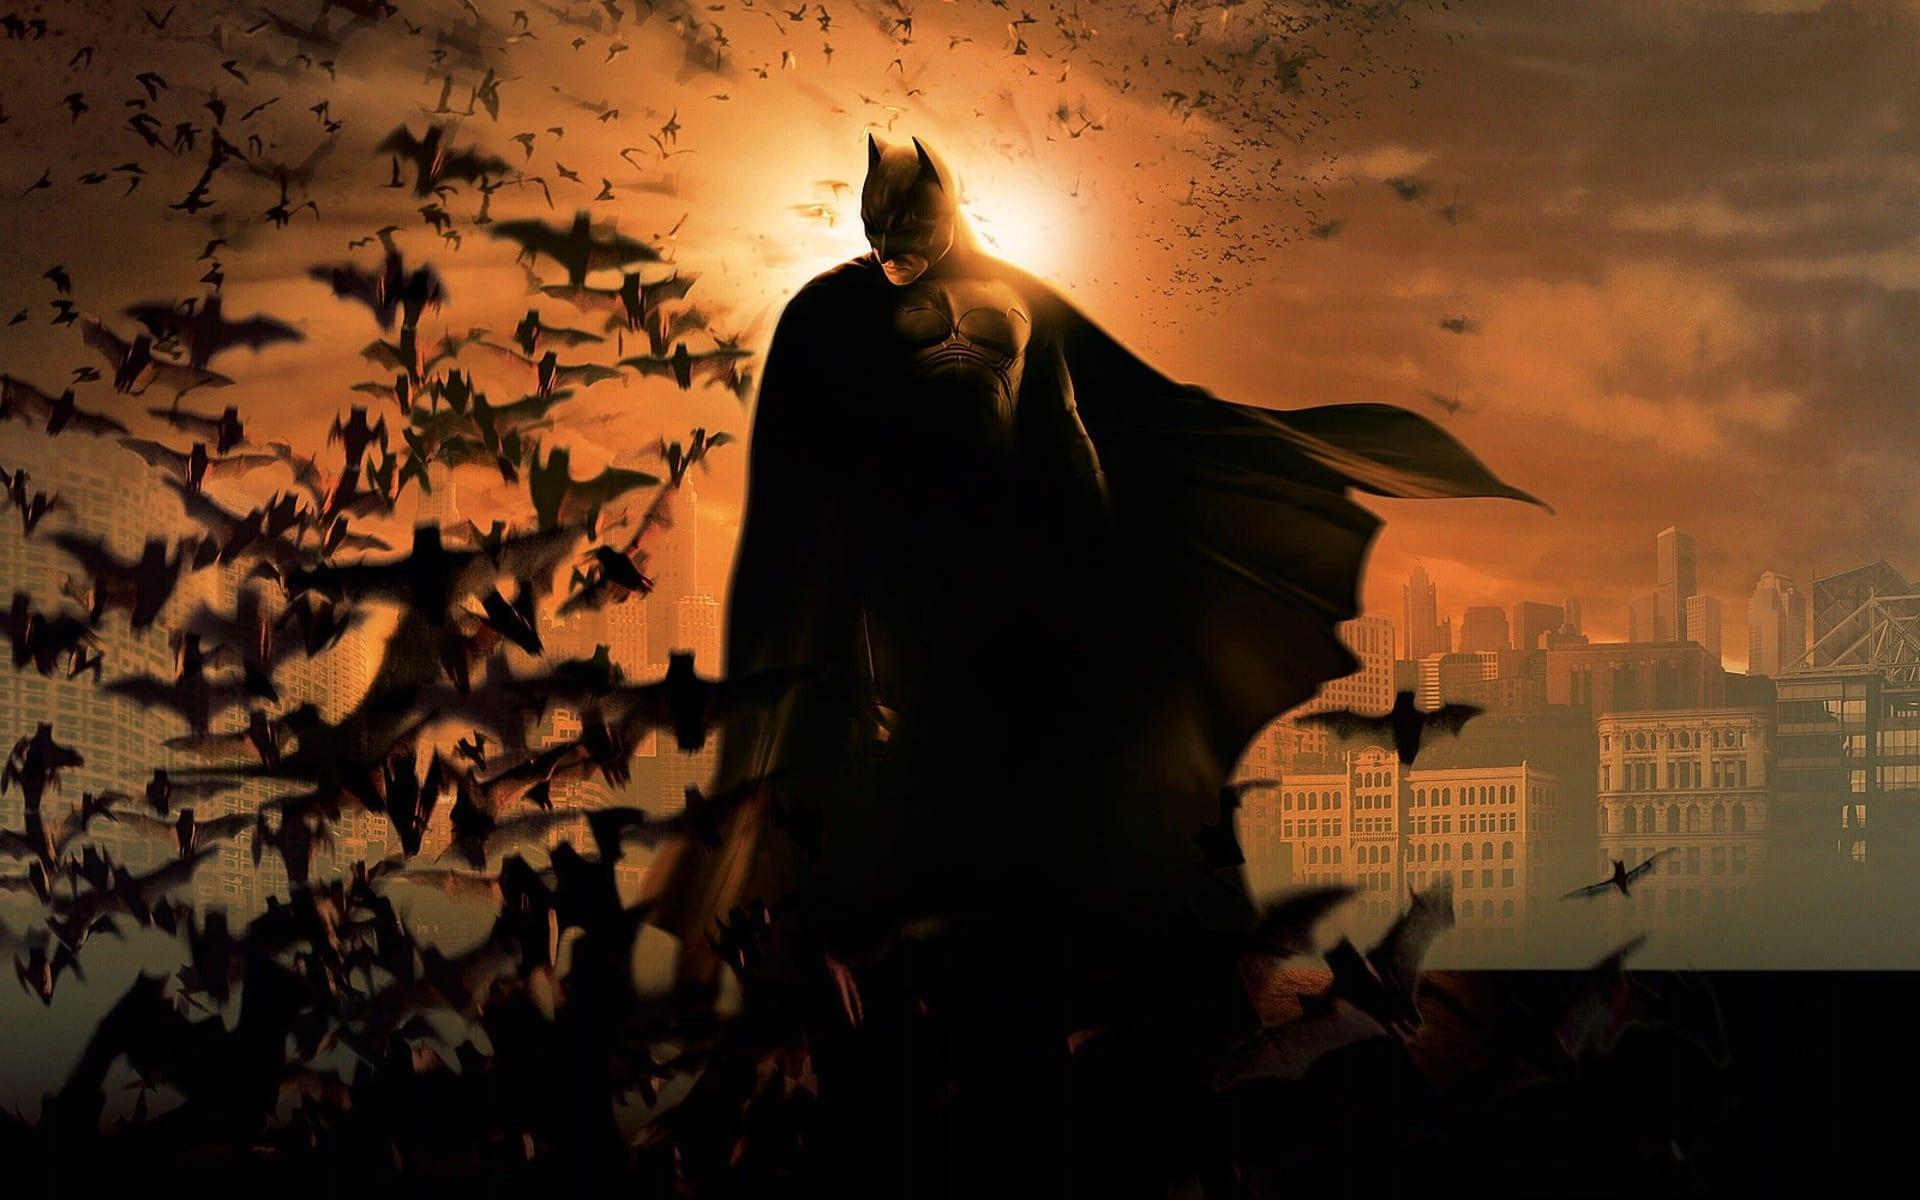 Batman The Dark Knight Rises Theme